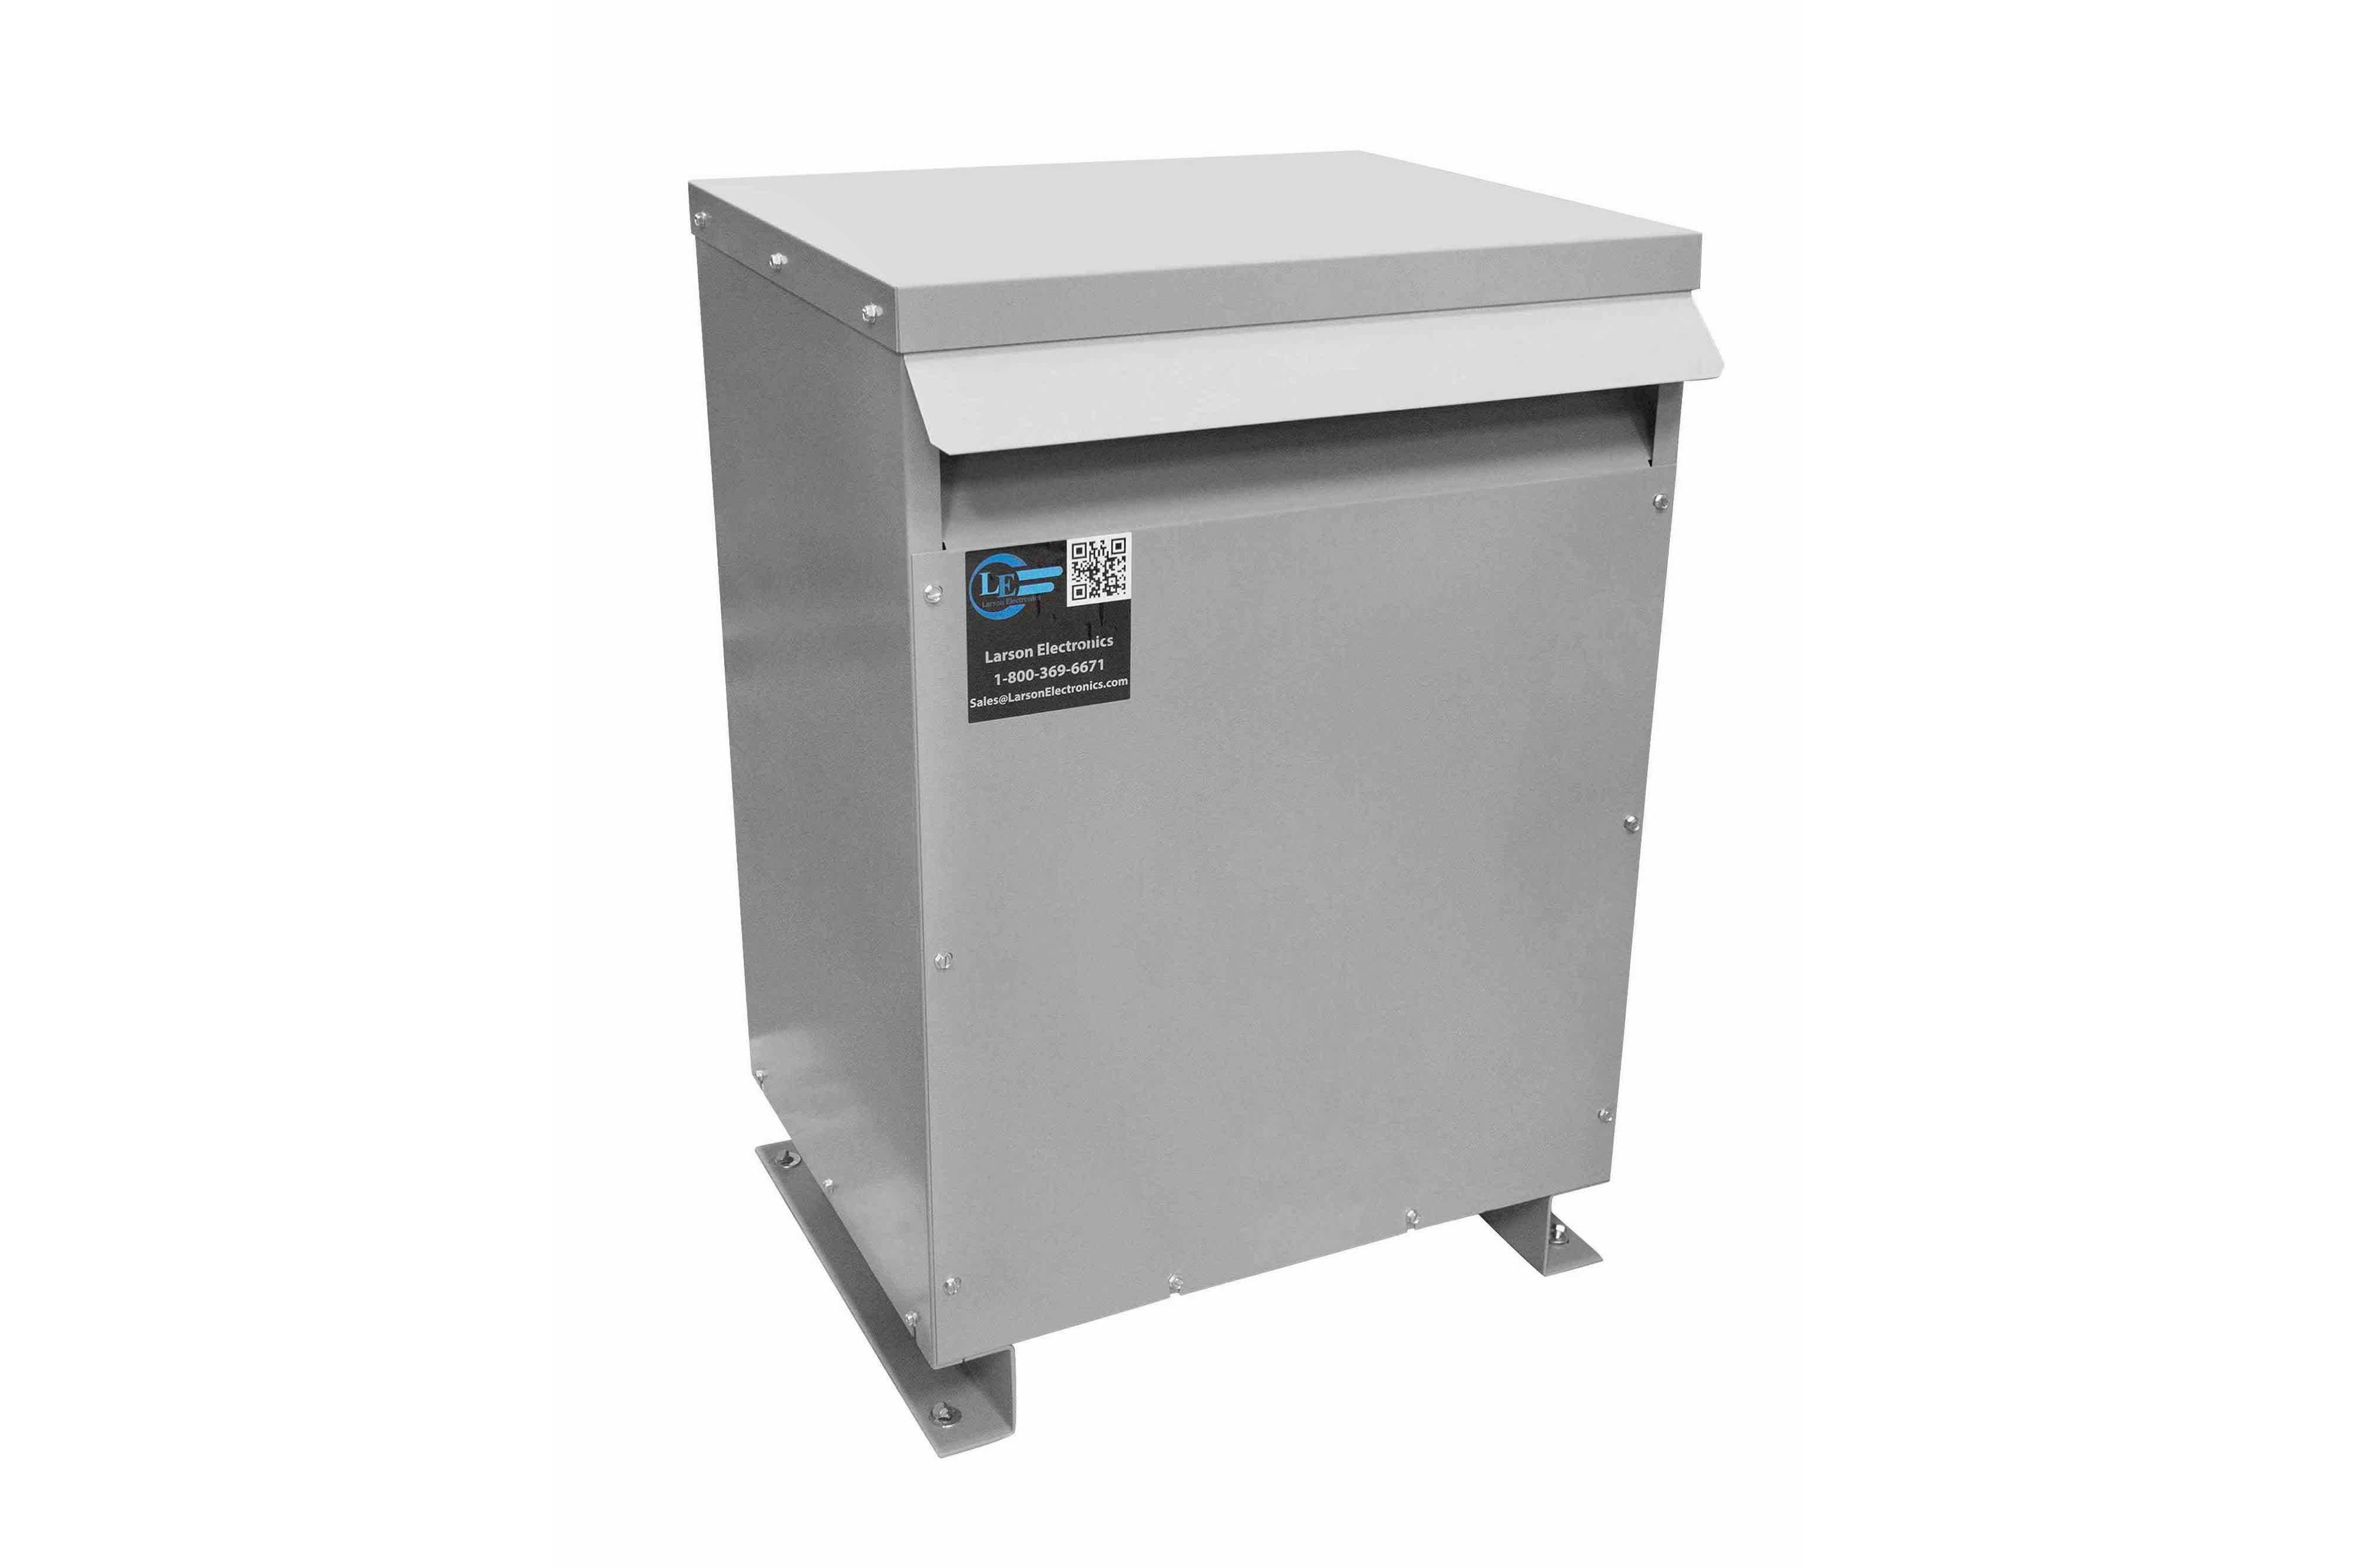 200 kVA 3PH Isolation Transformer, 480V Wye Primary, 575V Delta Secondary, N3R, Ventilated, 60 Hz